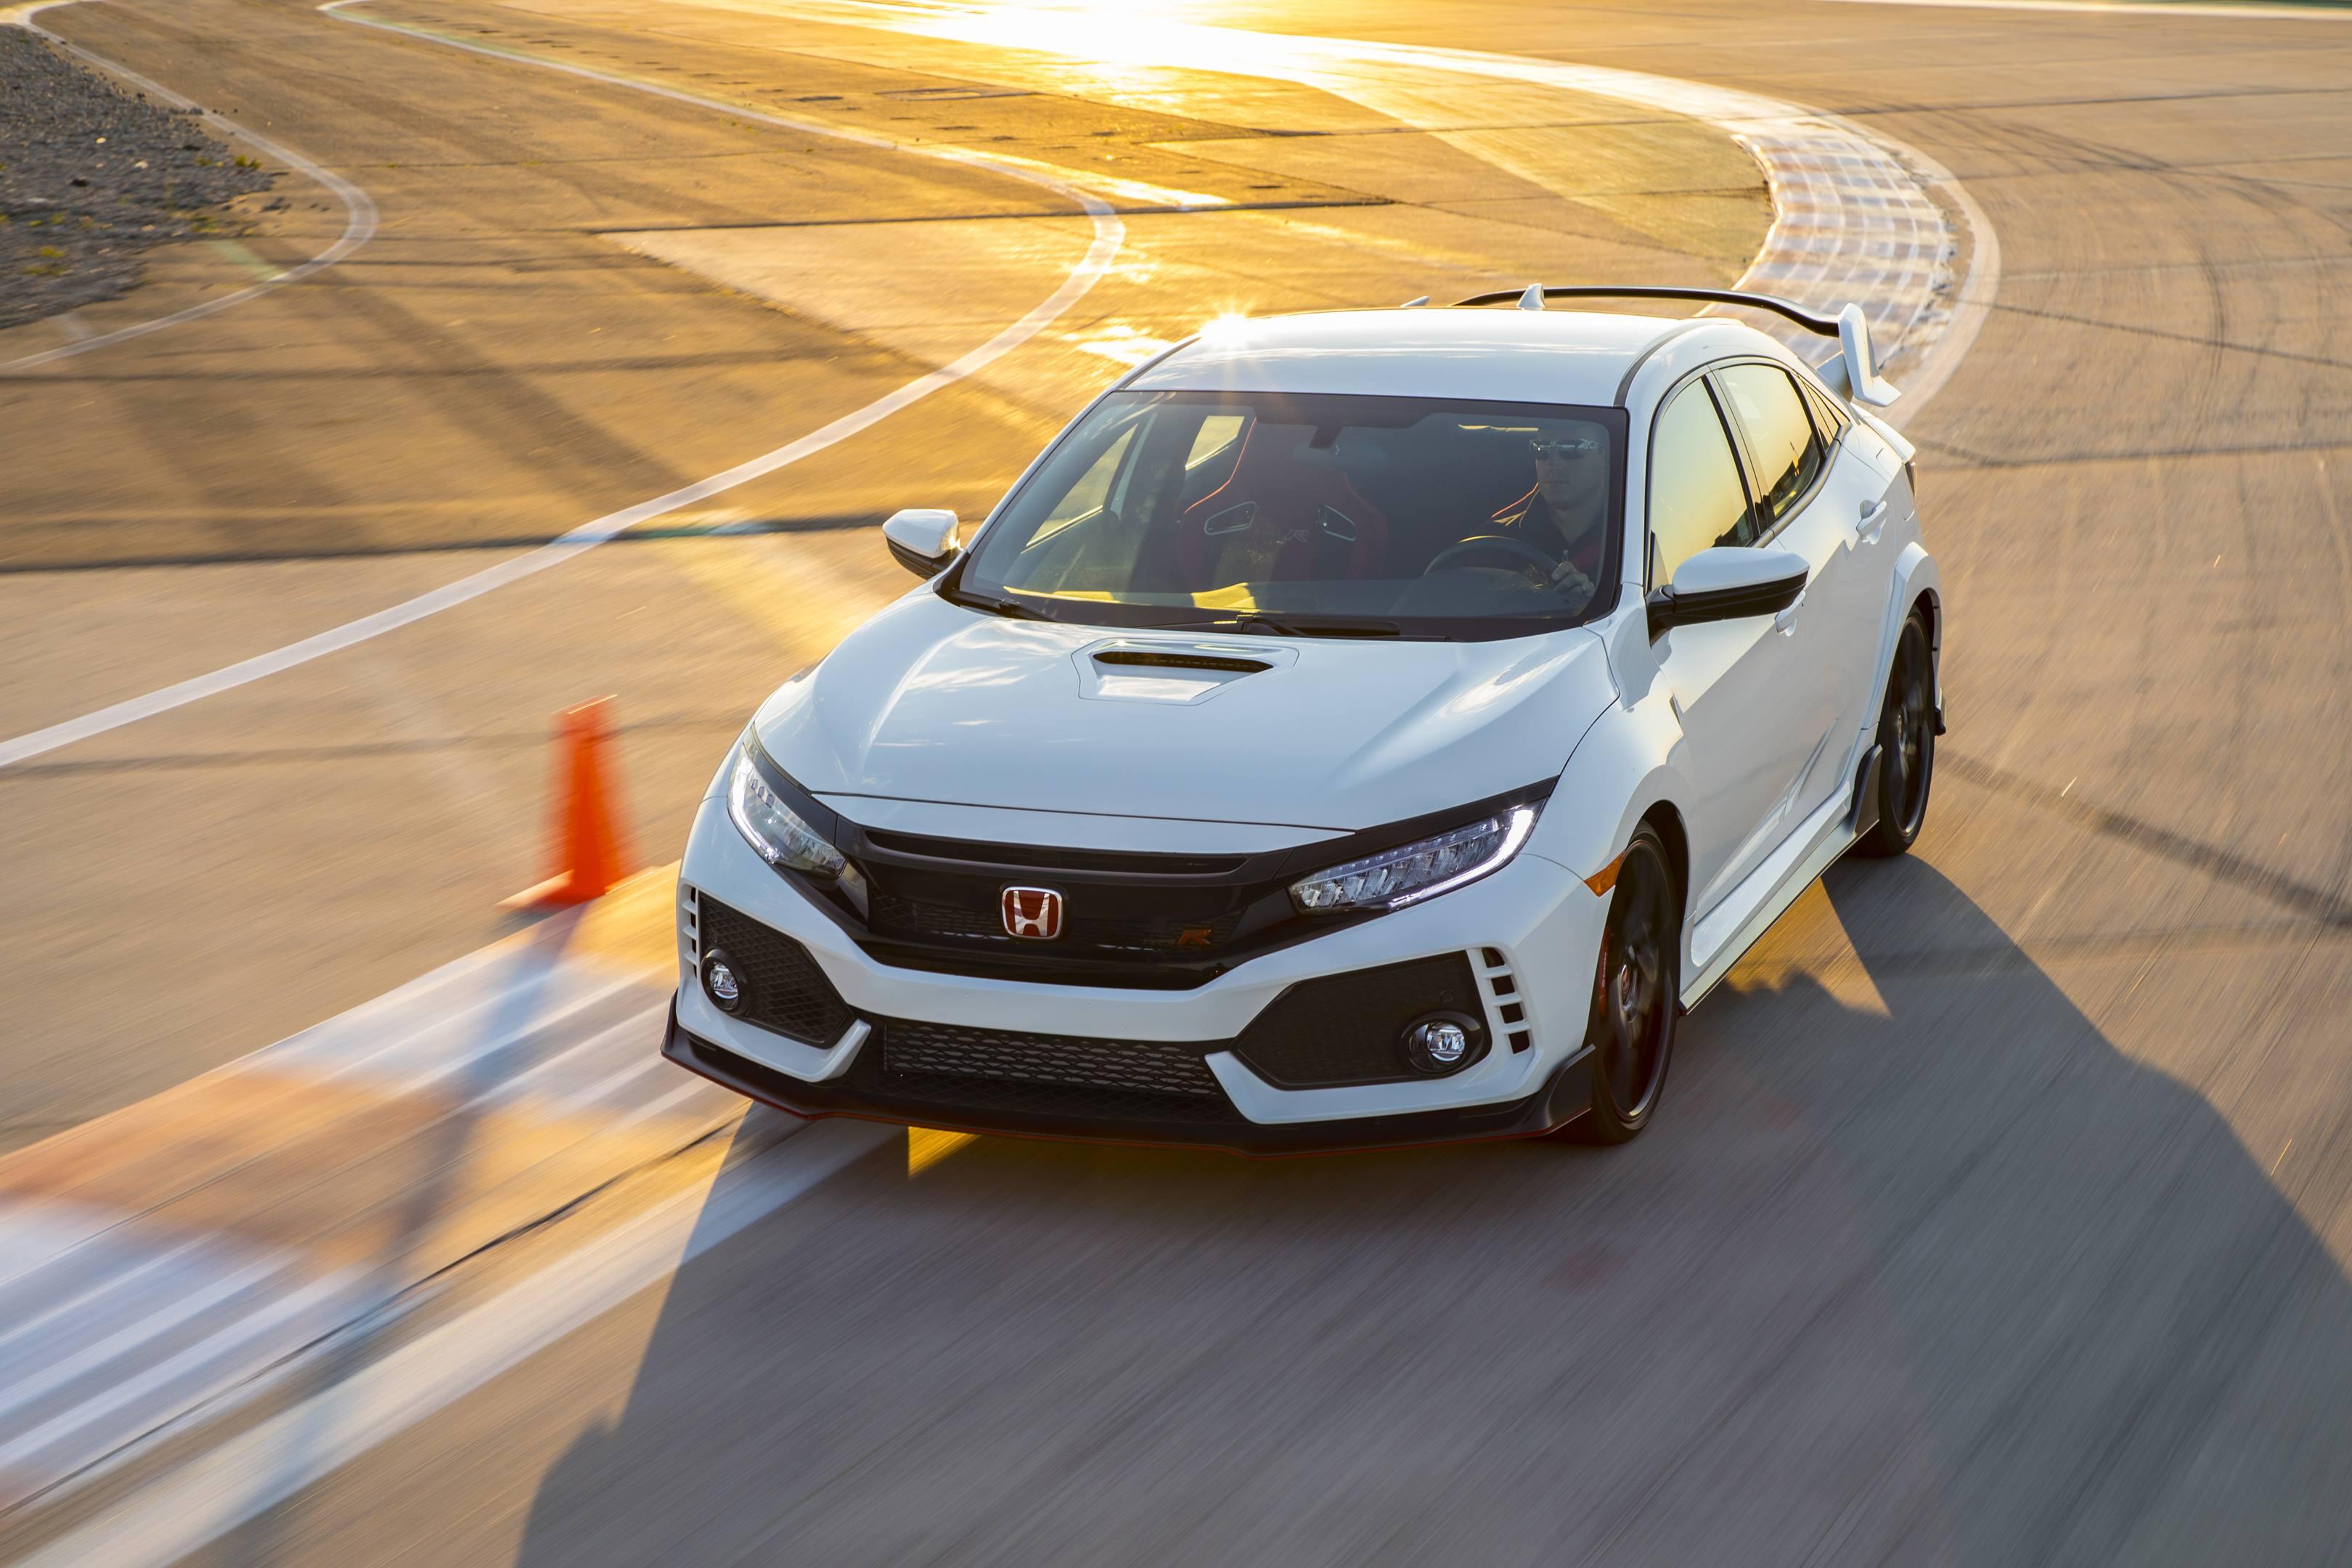 2017 Honda Civic Type R banking right